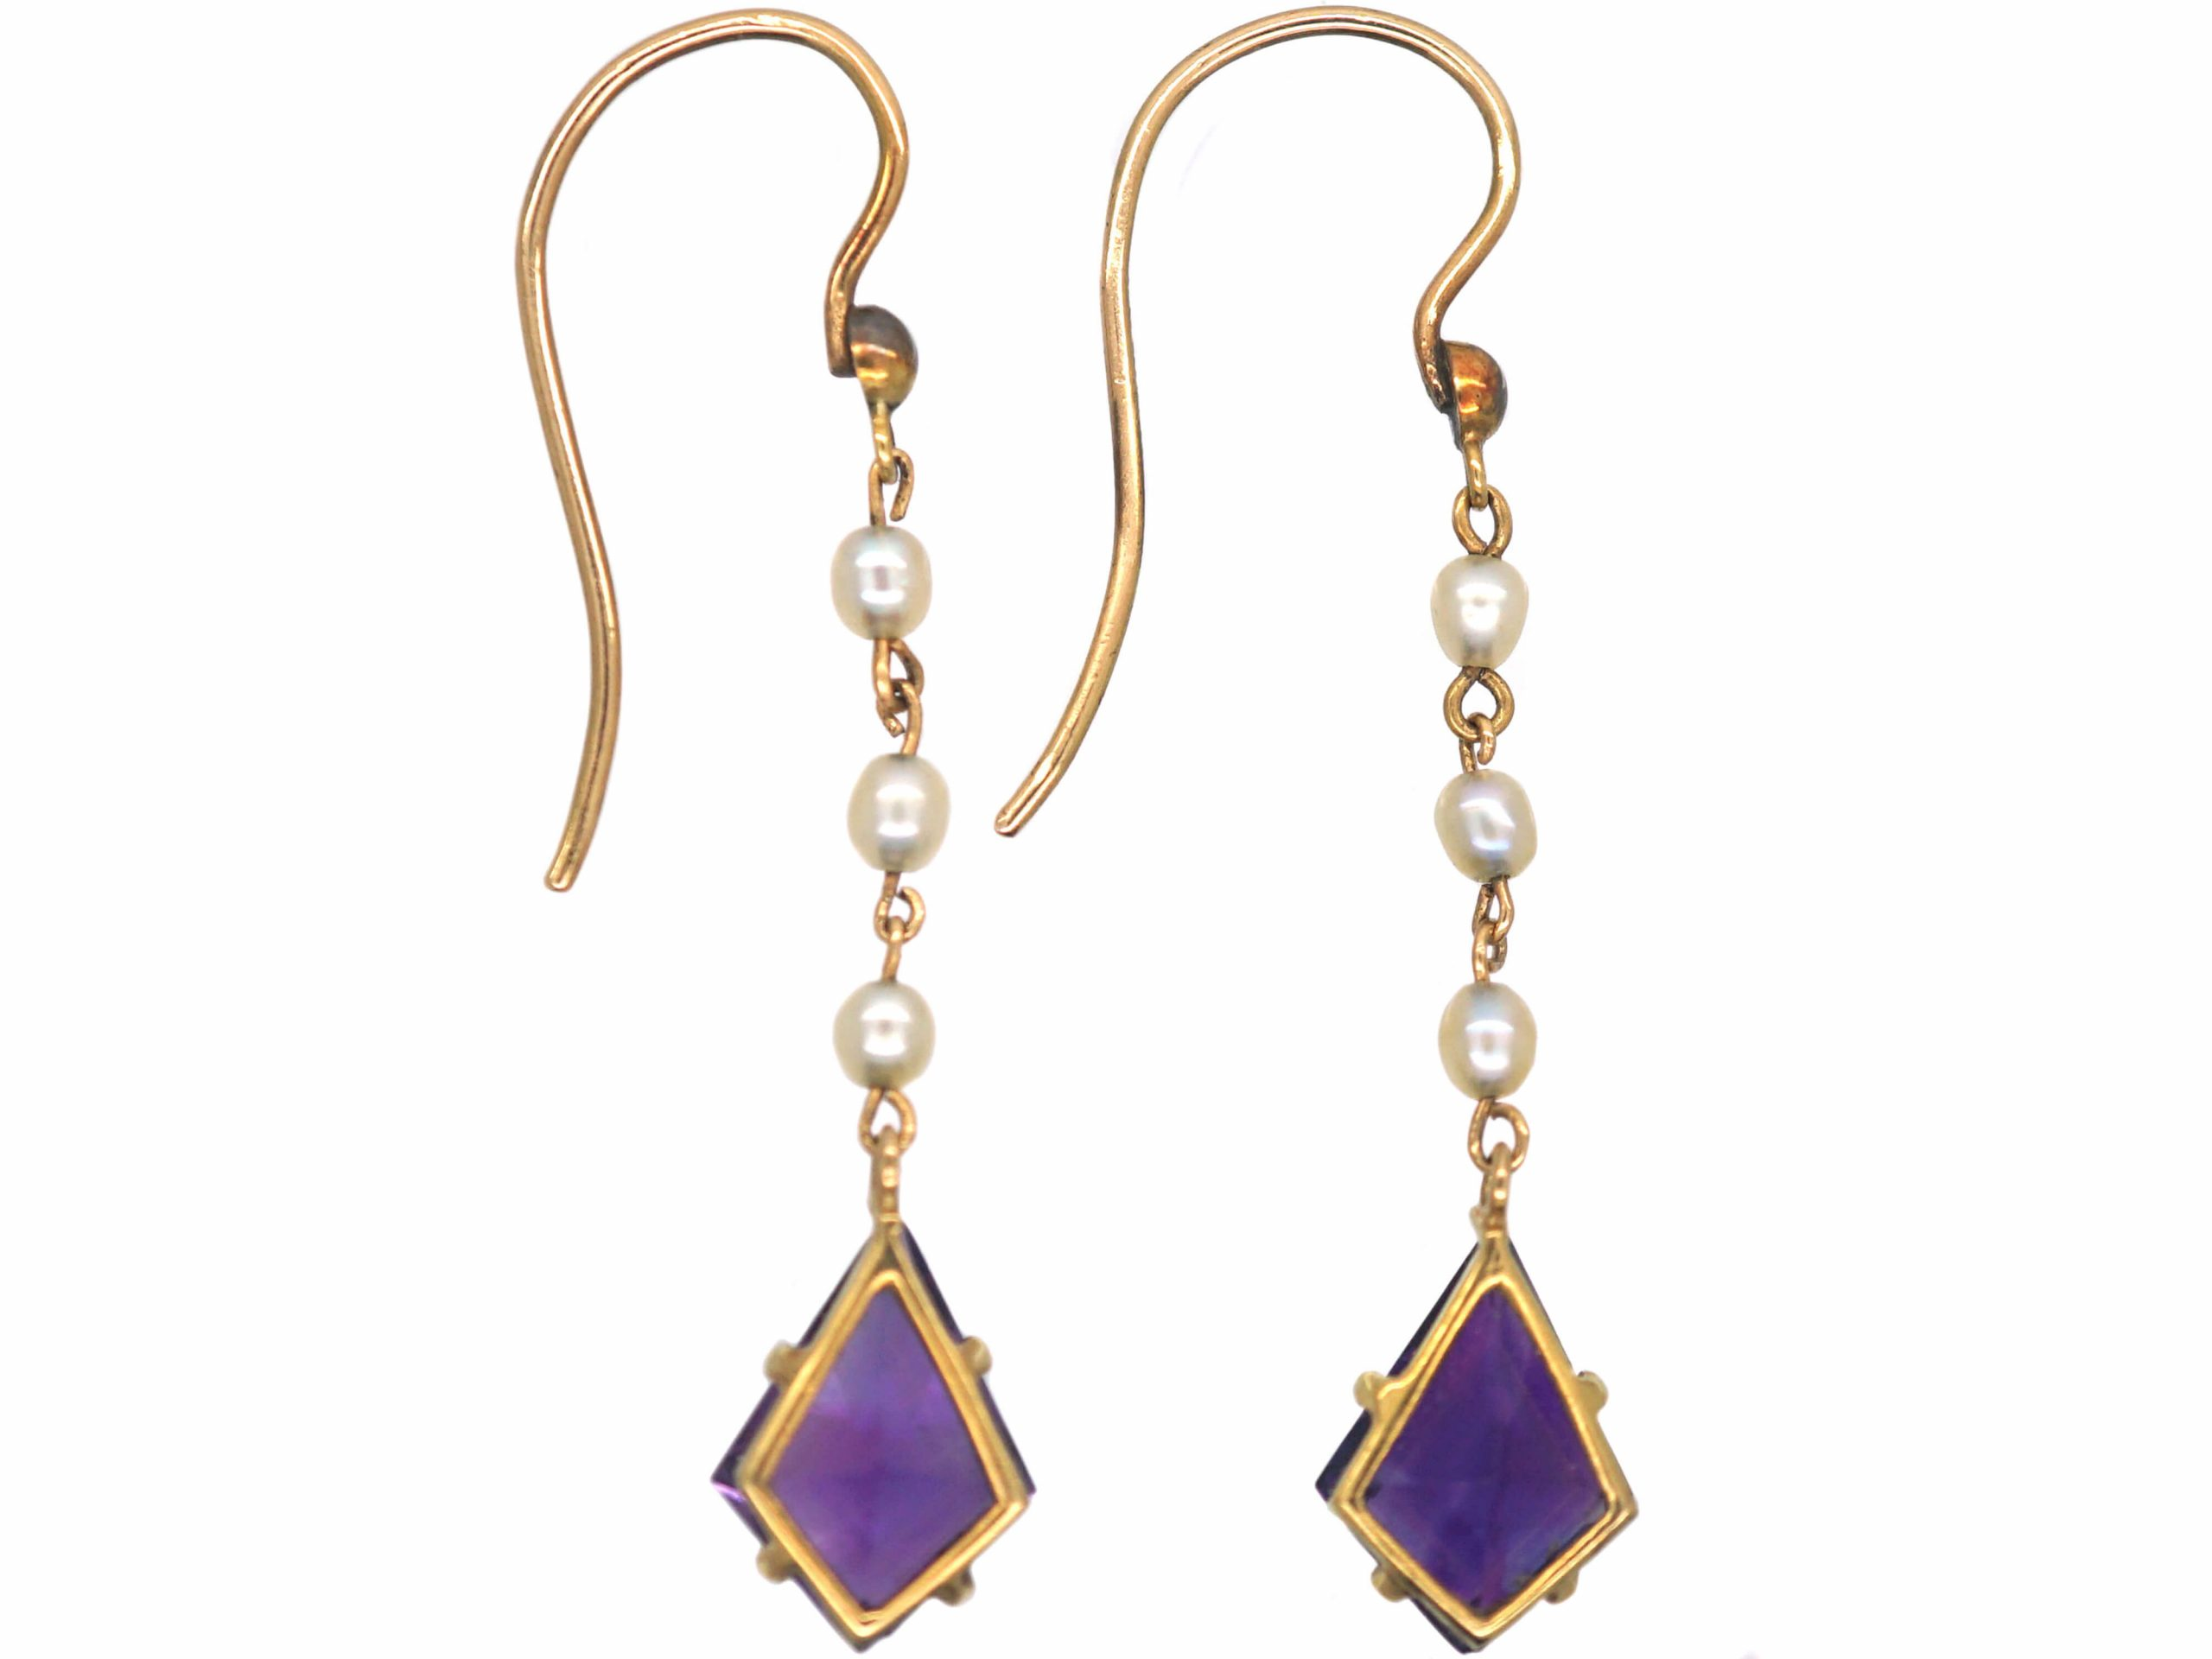 Art Deco 15ct Gold, Kite Shaped Amethyst & Natural Pearl Drop Earrings